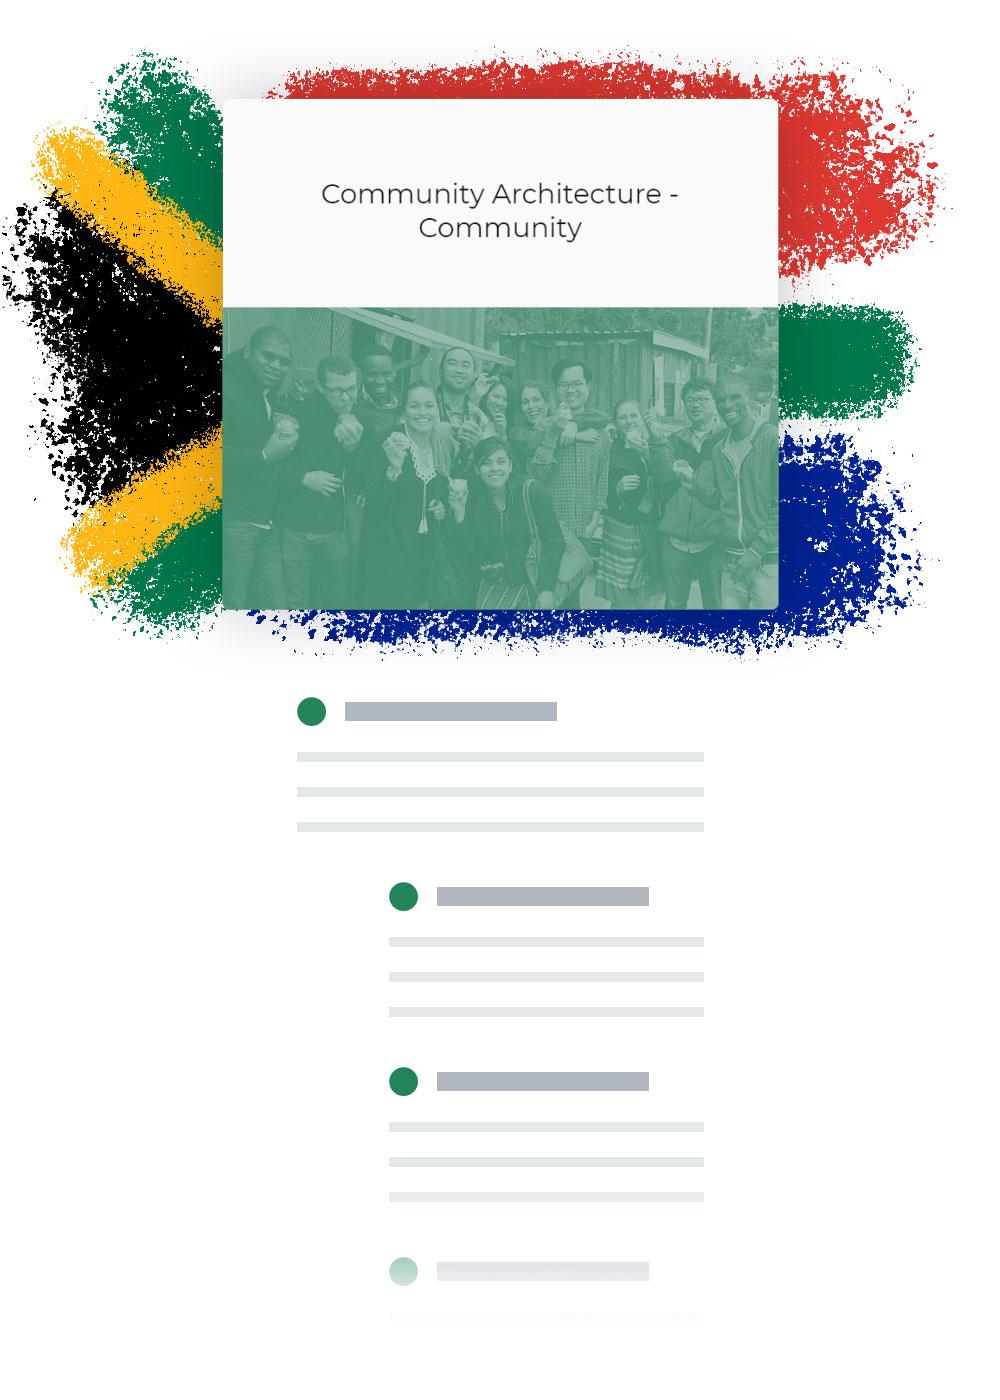 Zulu Architecture DesignClass community